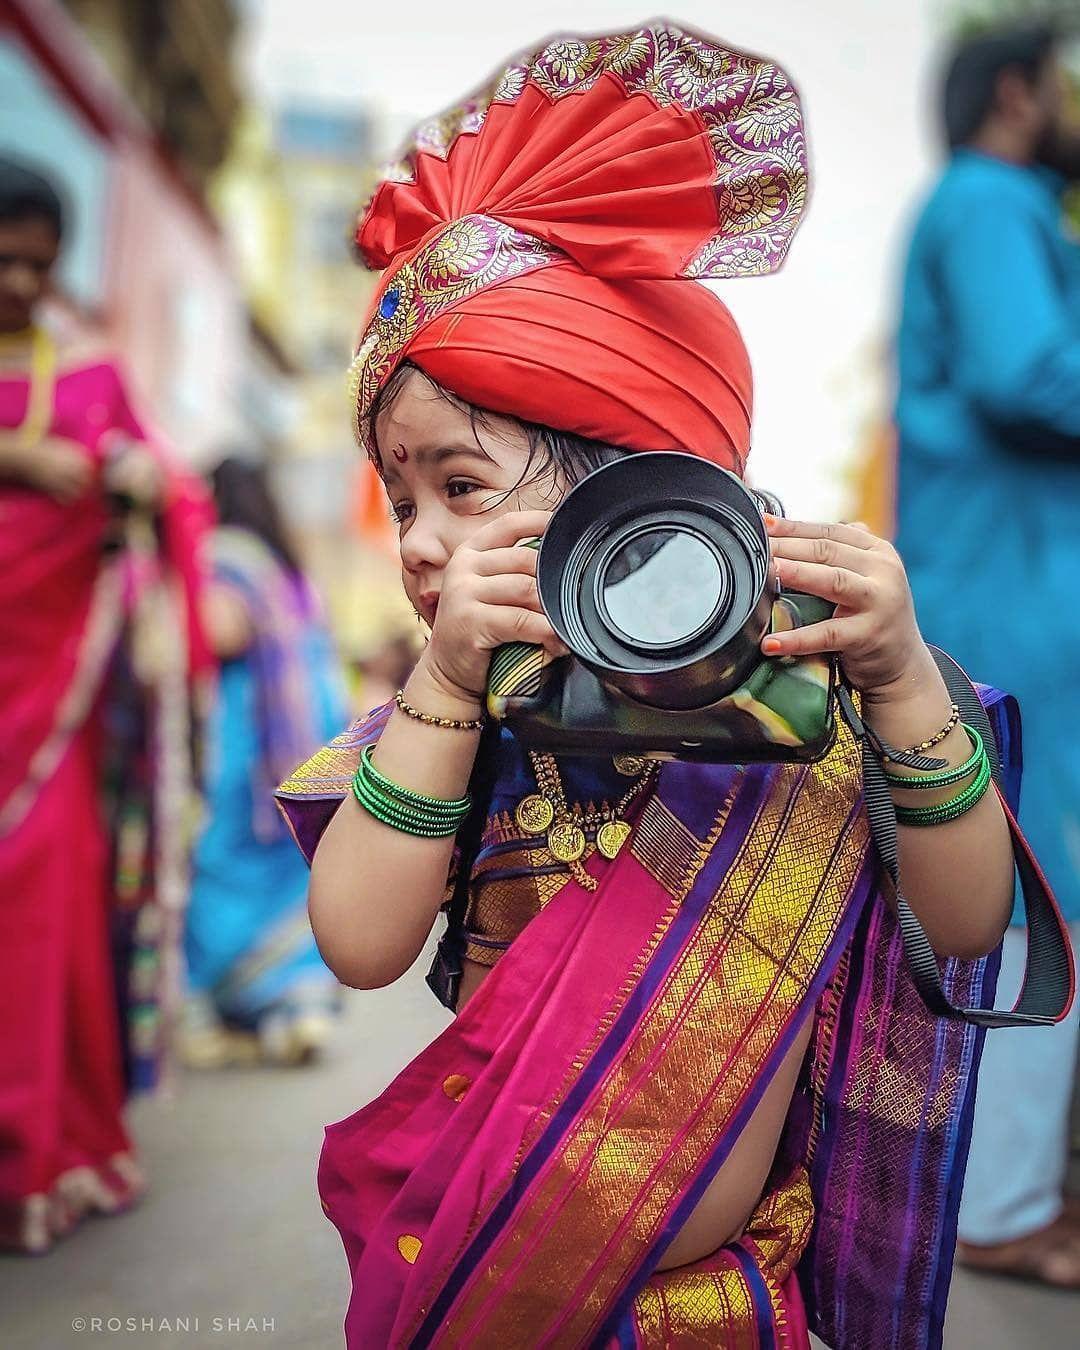 Happy Gudhipadva . Pictures Credi | Worldwide photography, Cute ...